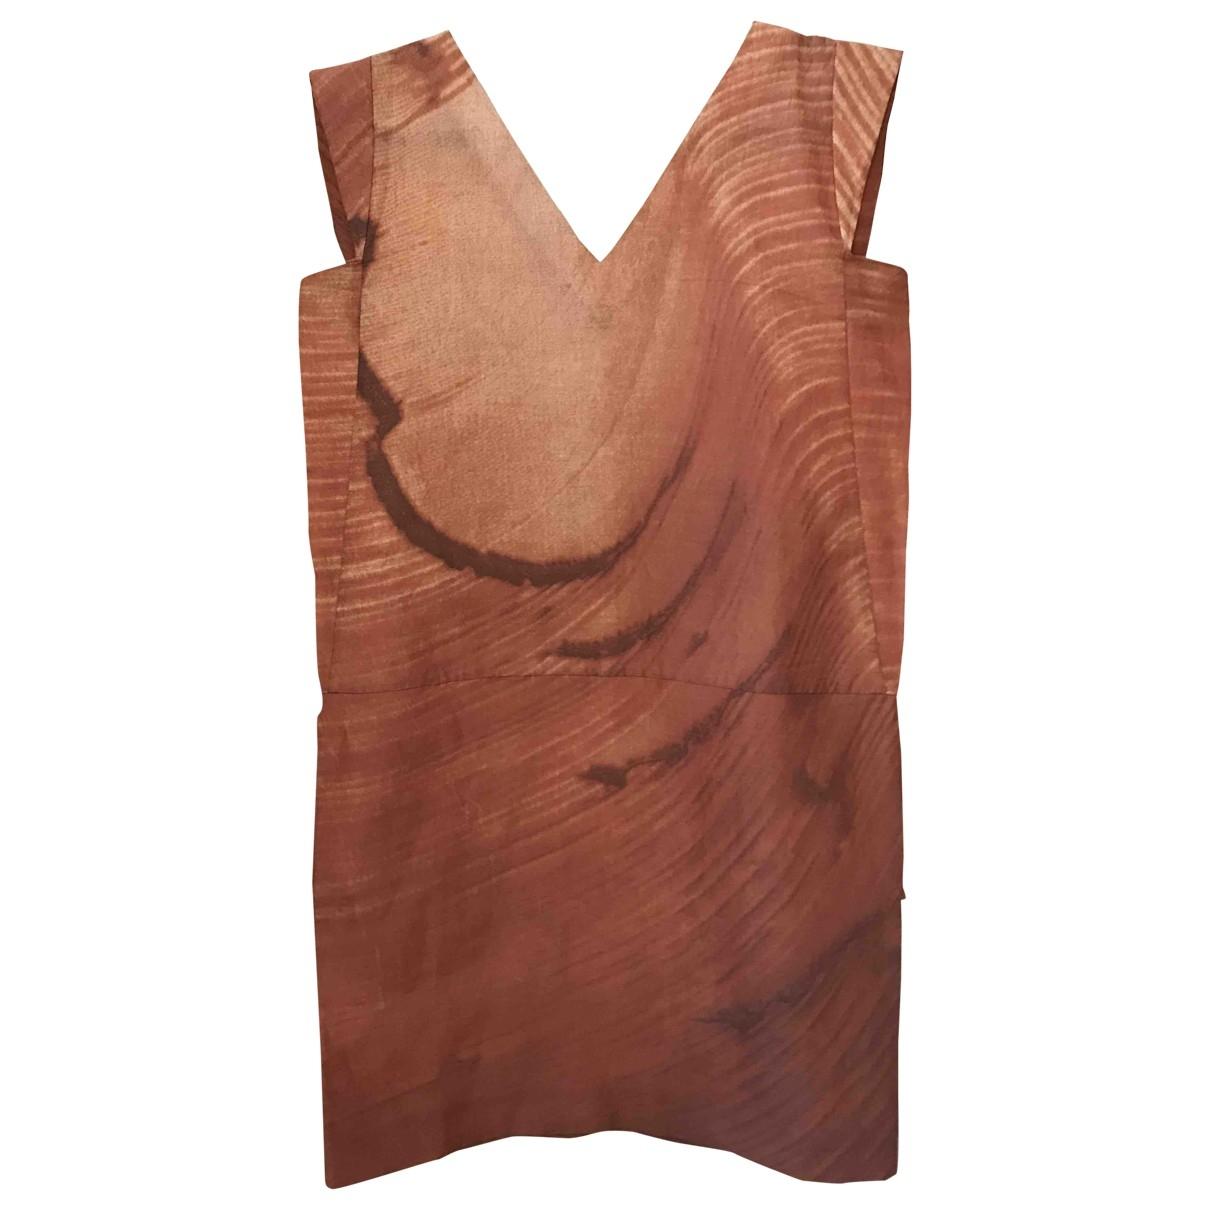 Marni \N Multicolour dress for Women 42 IT